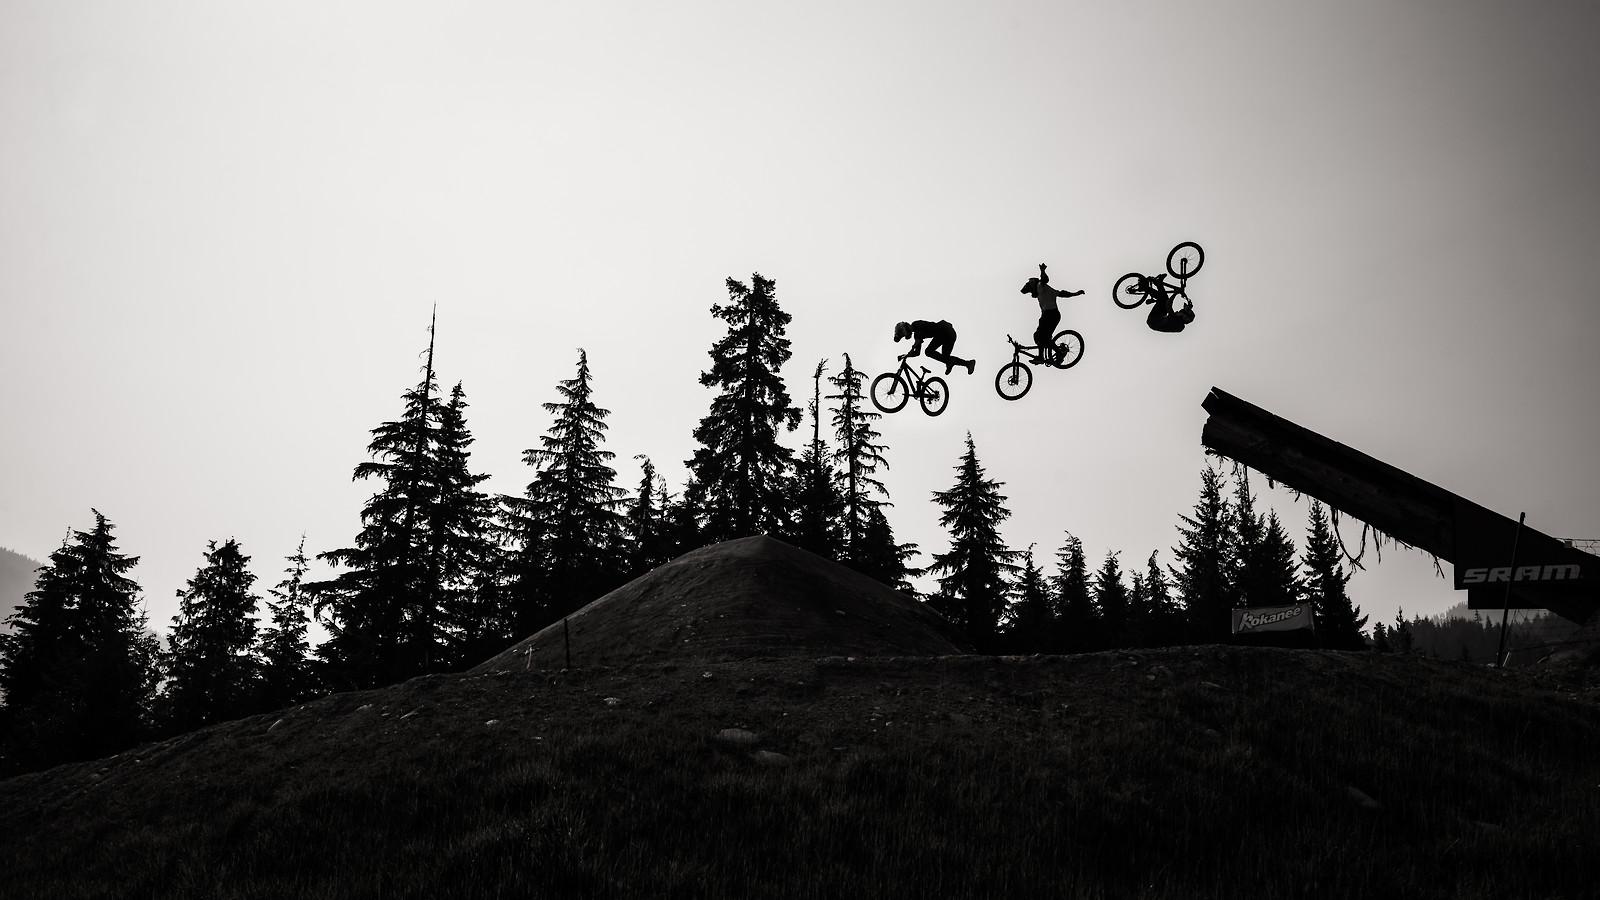 3 airs - phunkt.com - Mountain Biking Pictures - Vital MTB